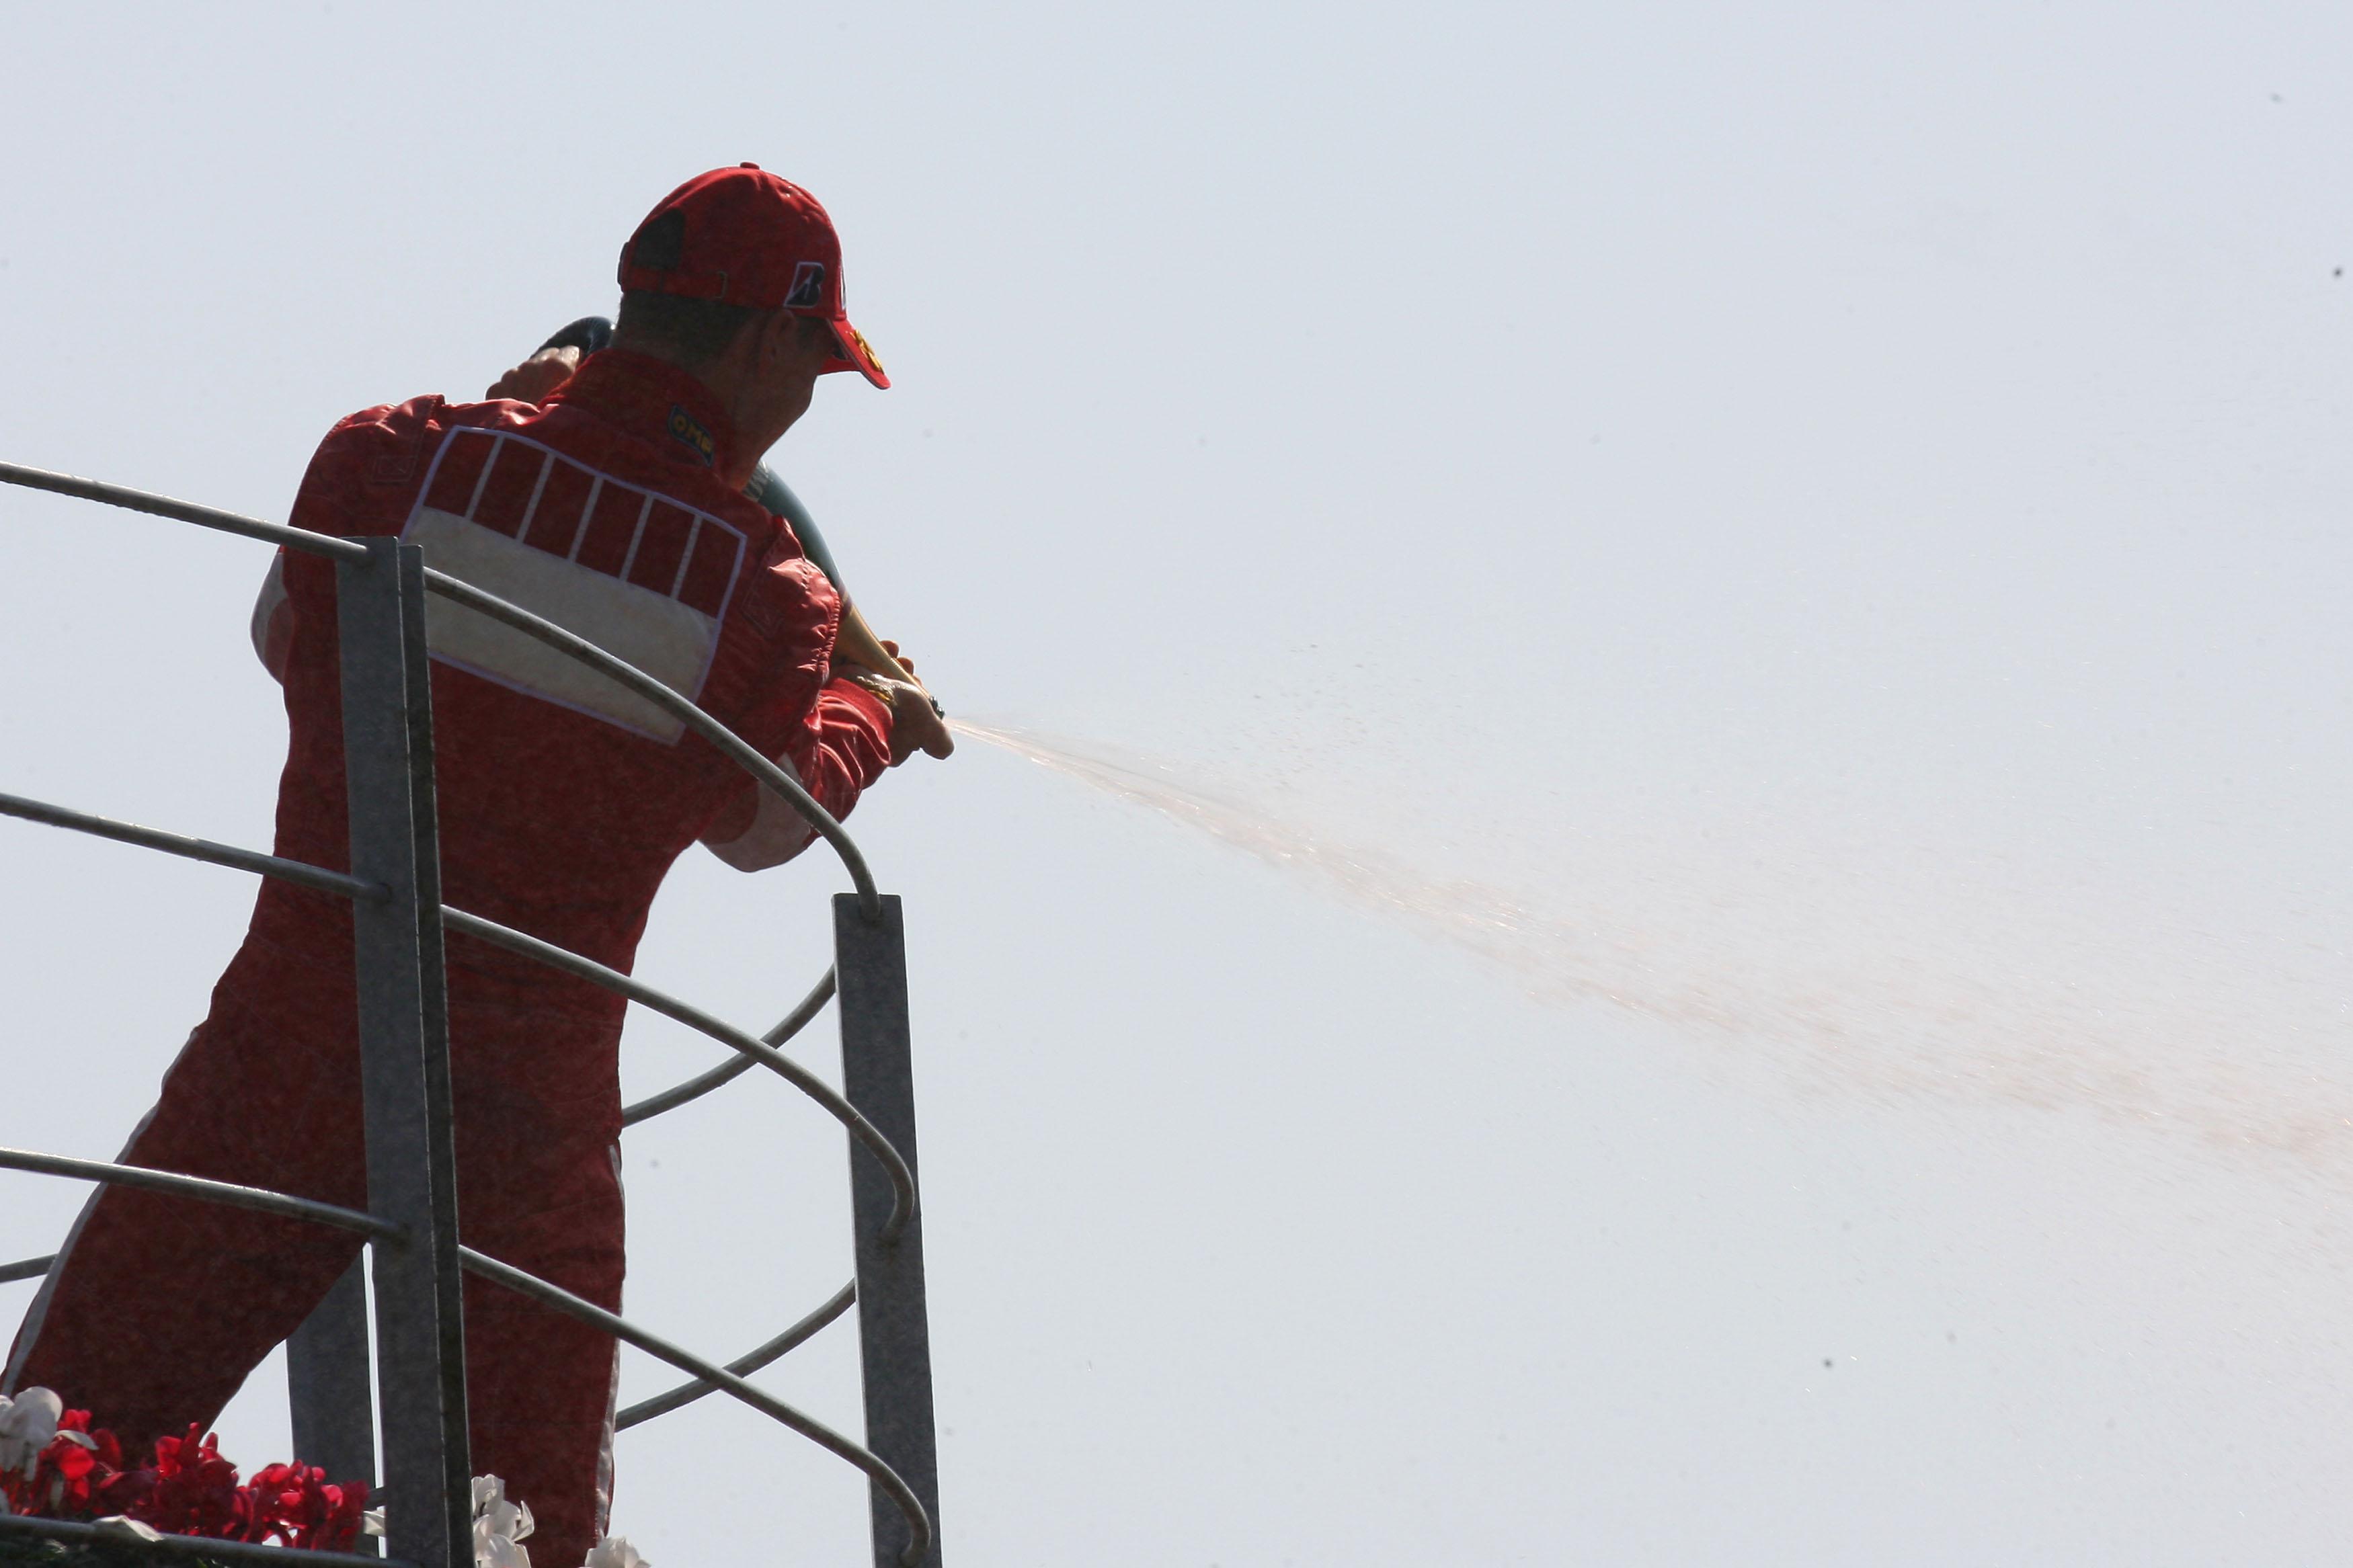 Michael Schumacher wins Italian Grand Prix 2006